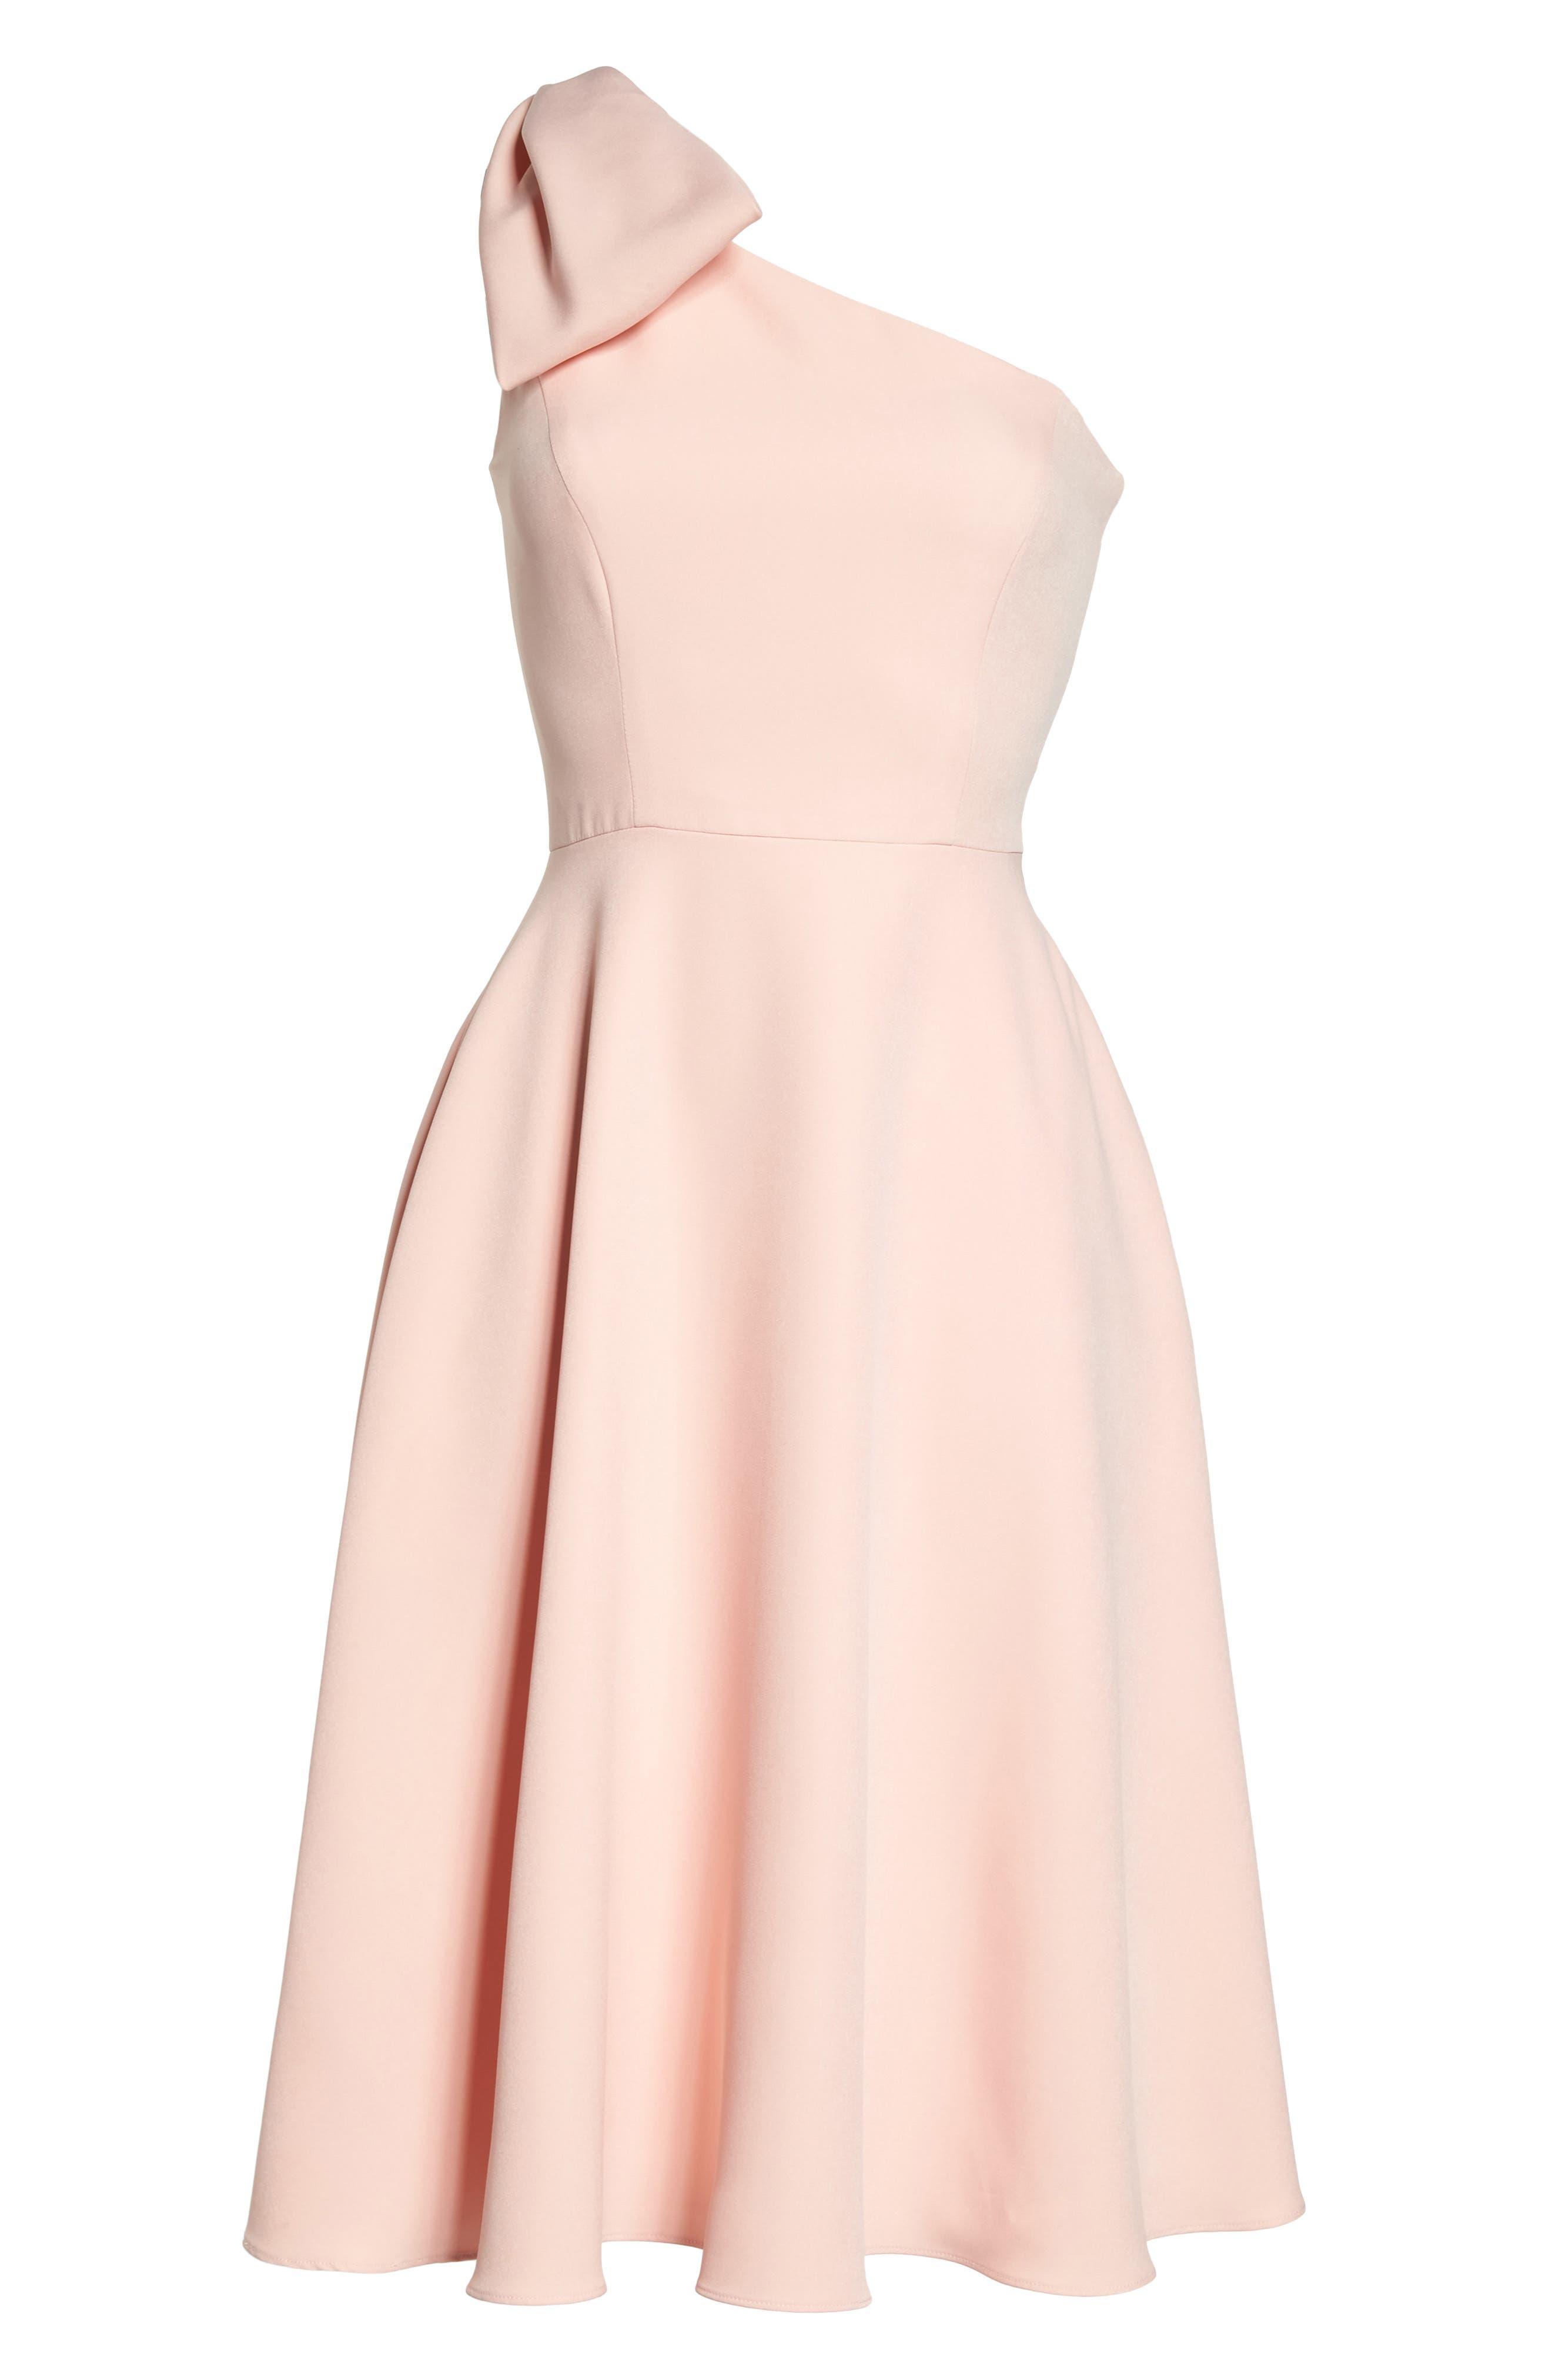 Yvonne Dream Crepe One-Shoulder Dress,                             Alternate thumbnail 8, color,                             Rose Quartz